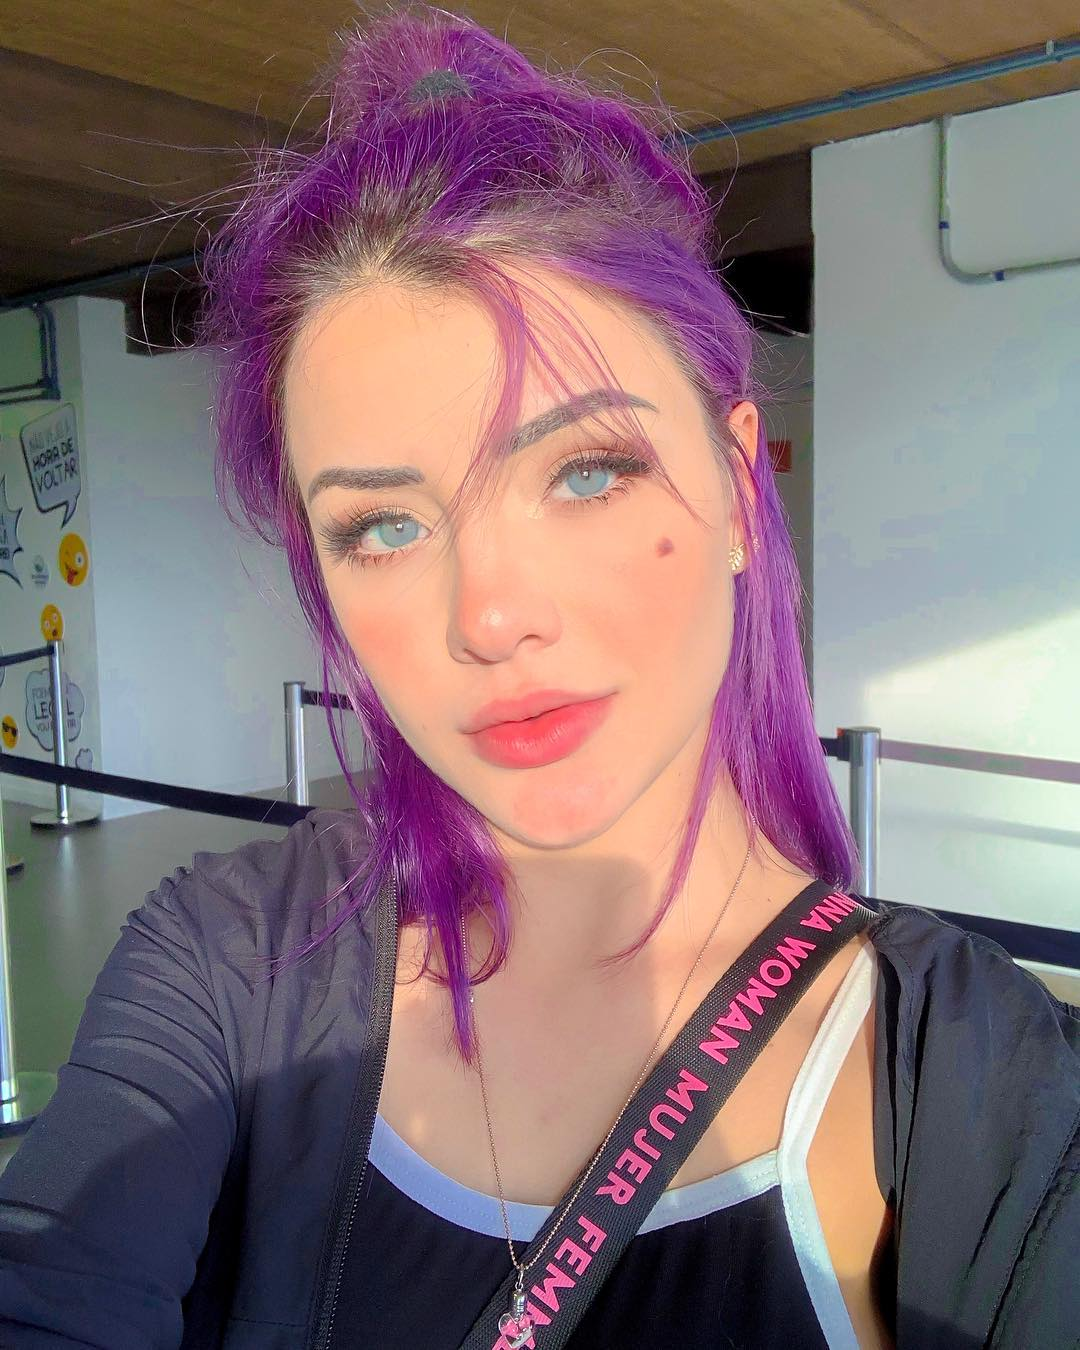 cabelo roxo 42